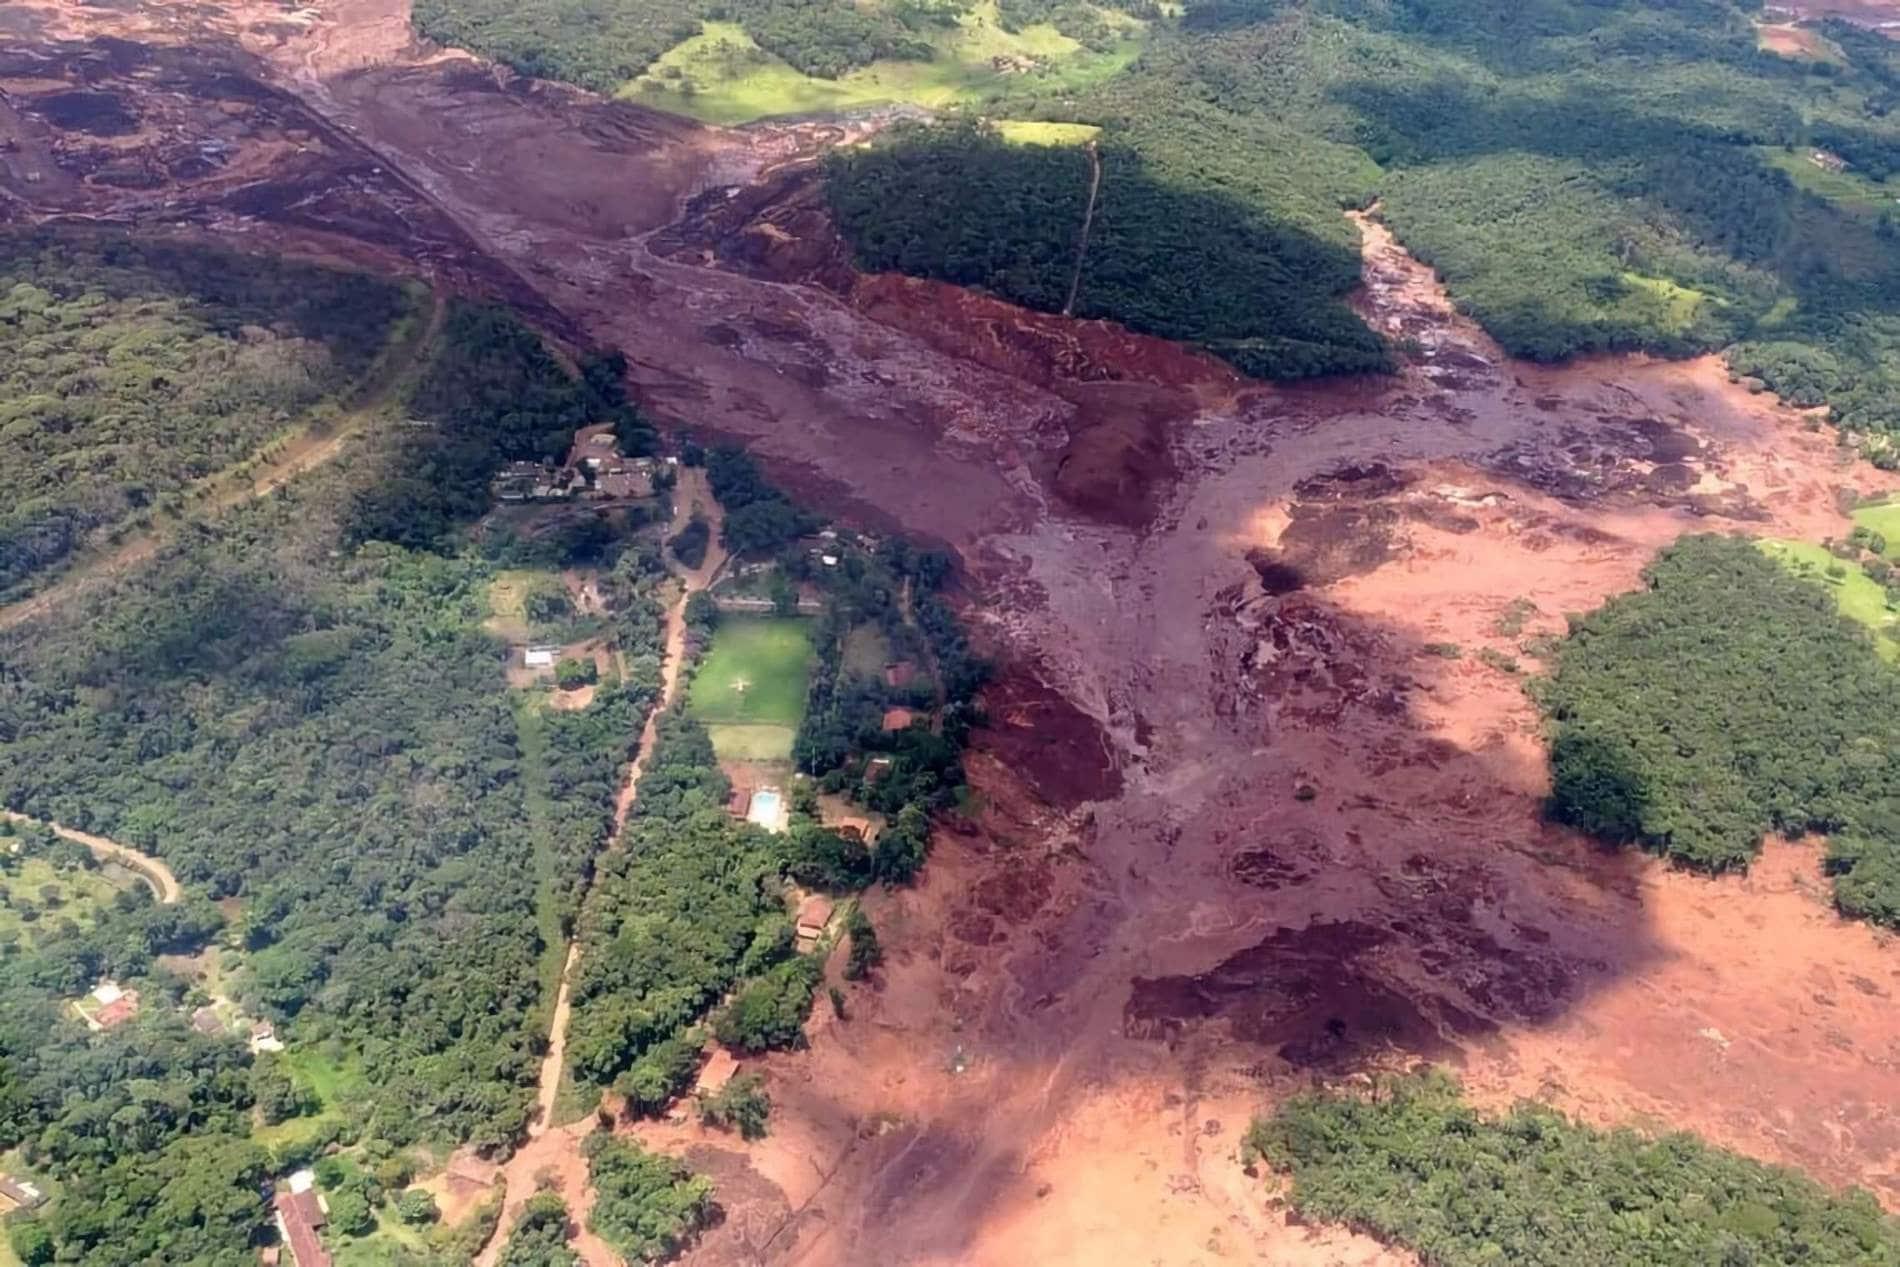 , Pataxó Hã-hã-hãe future uncertain after tailings dam rupture in Brazil